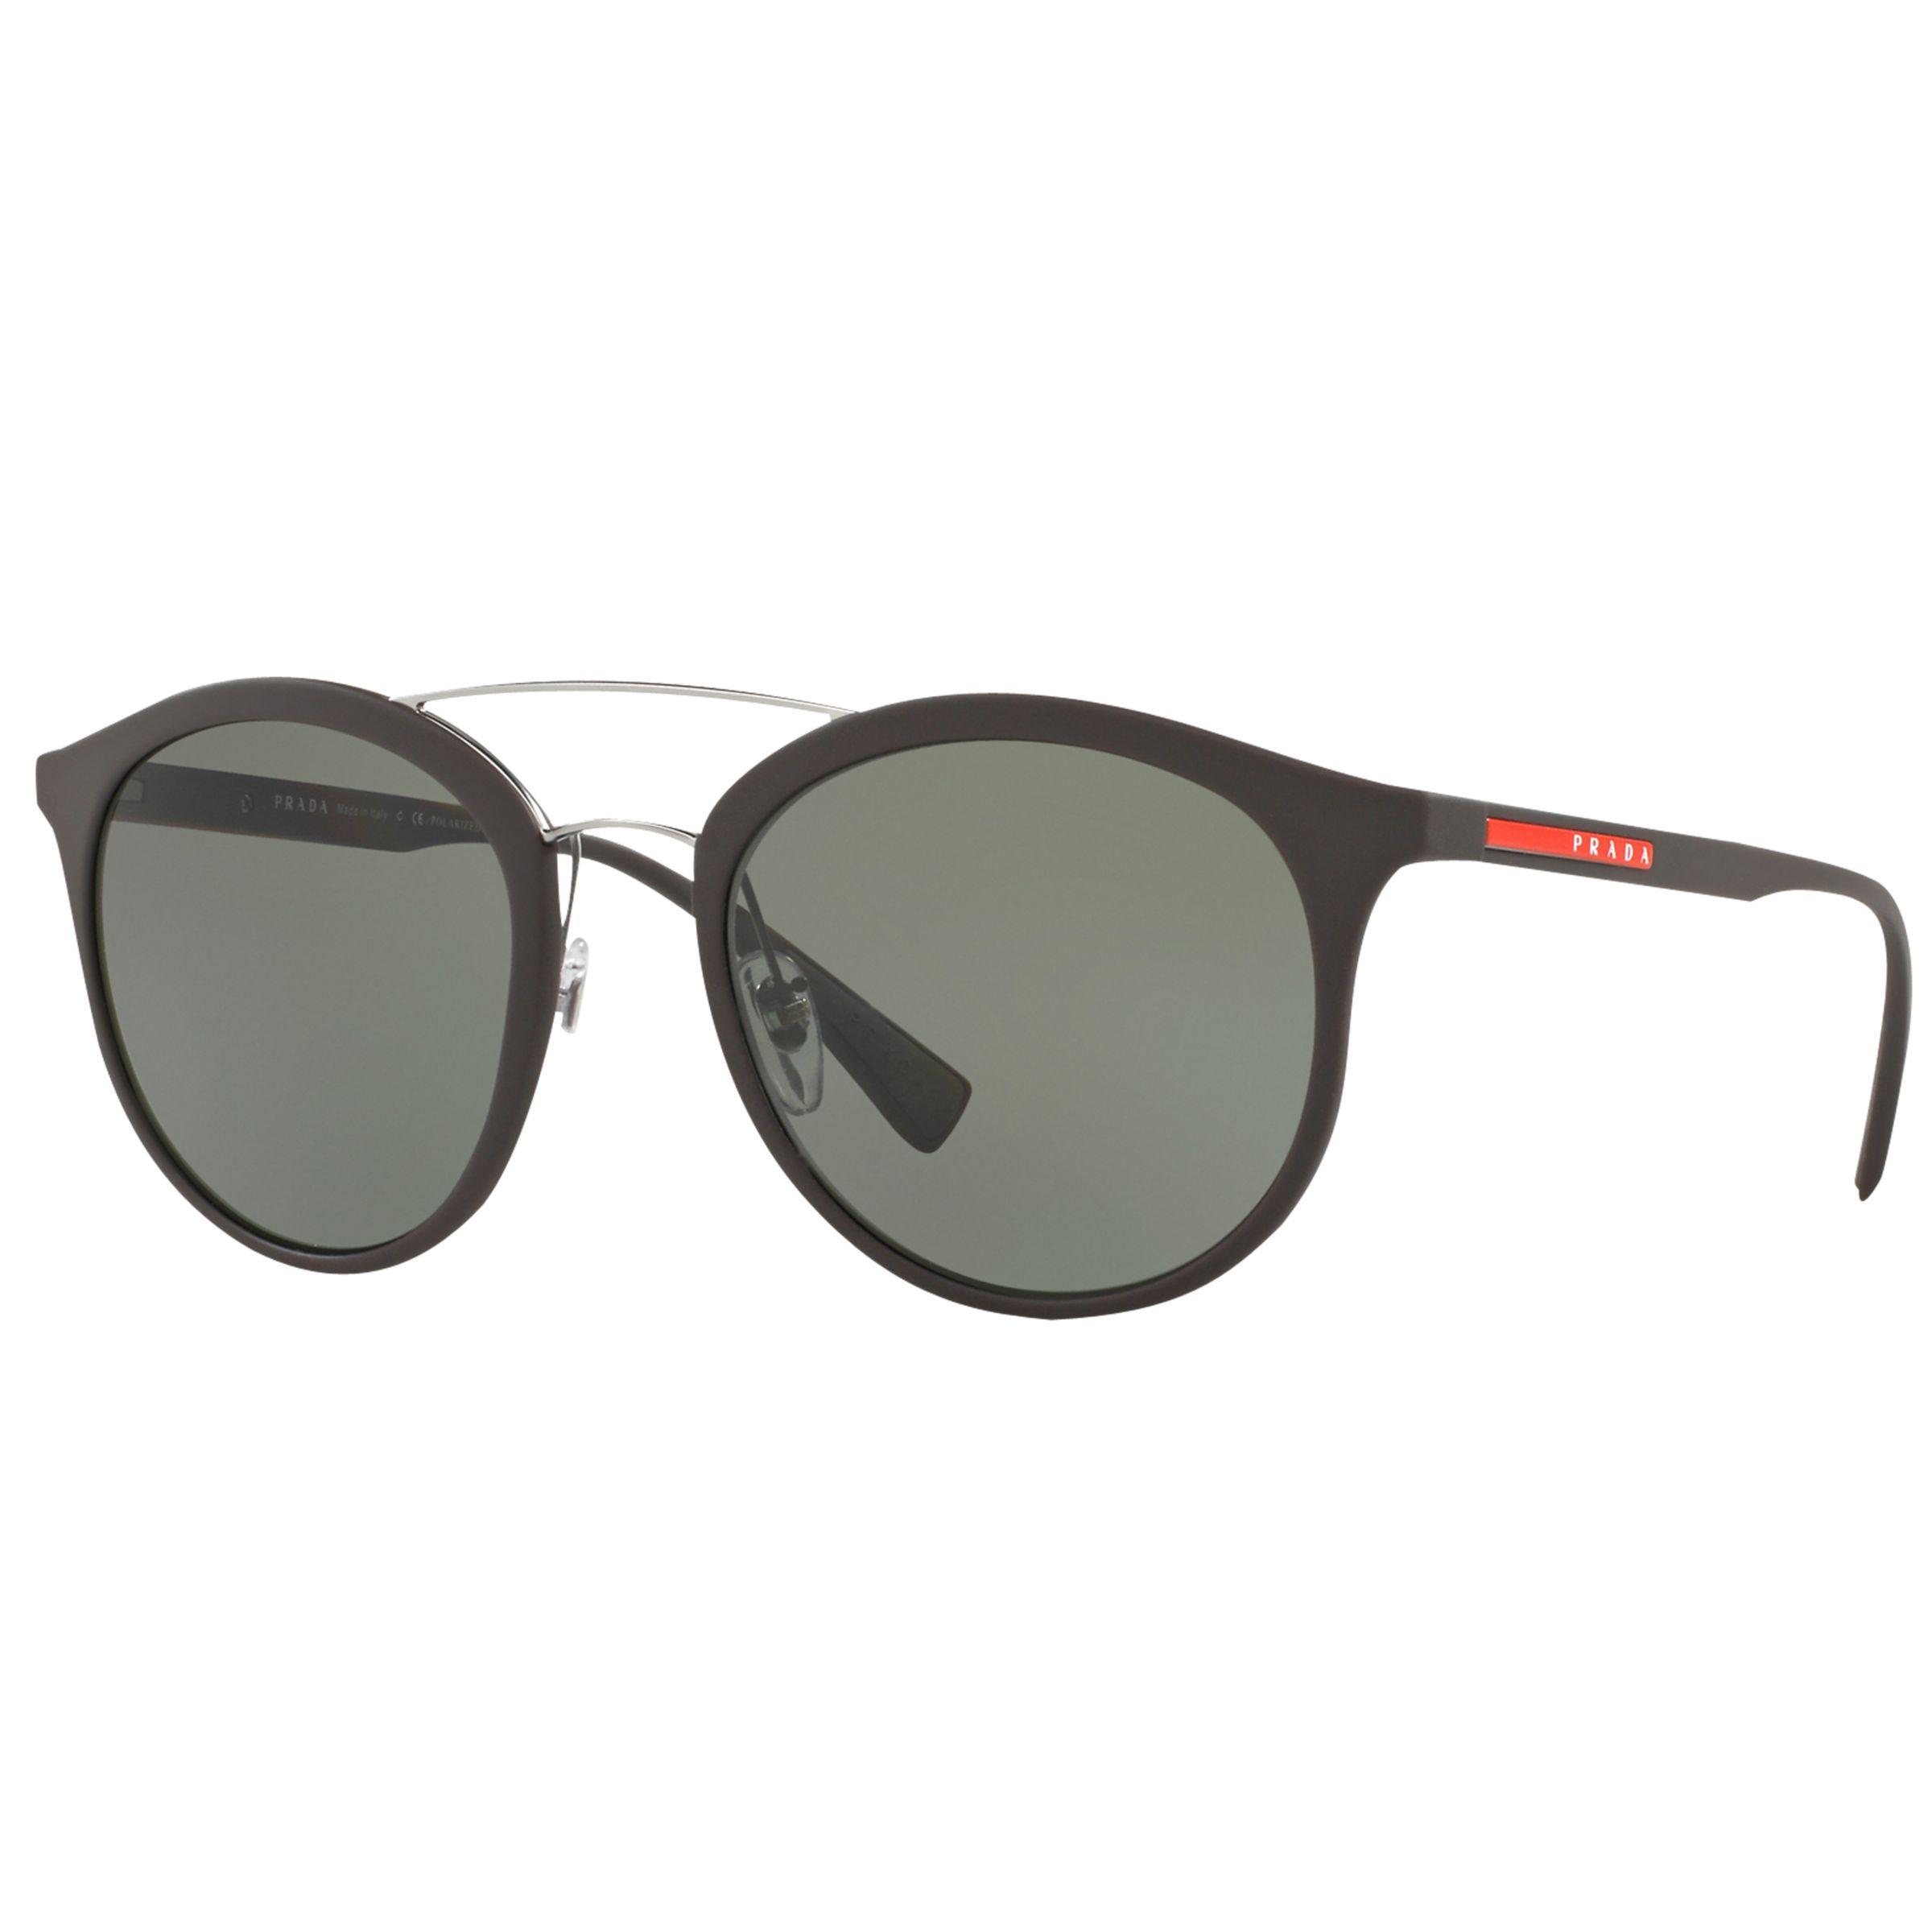 Prada Linea Rossa Prada Linea Rossa PS 04RS Polarised Oval Sunglasses, Dark Brown/Green